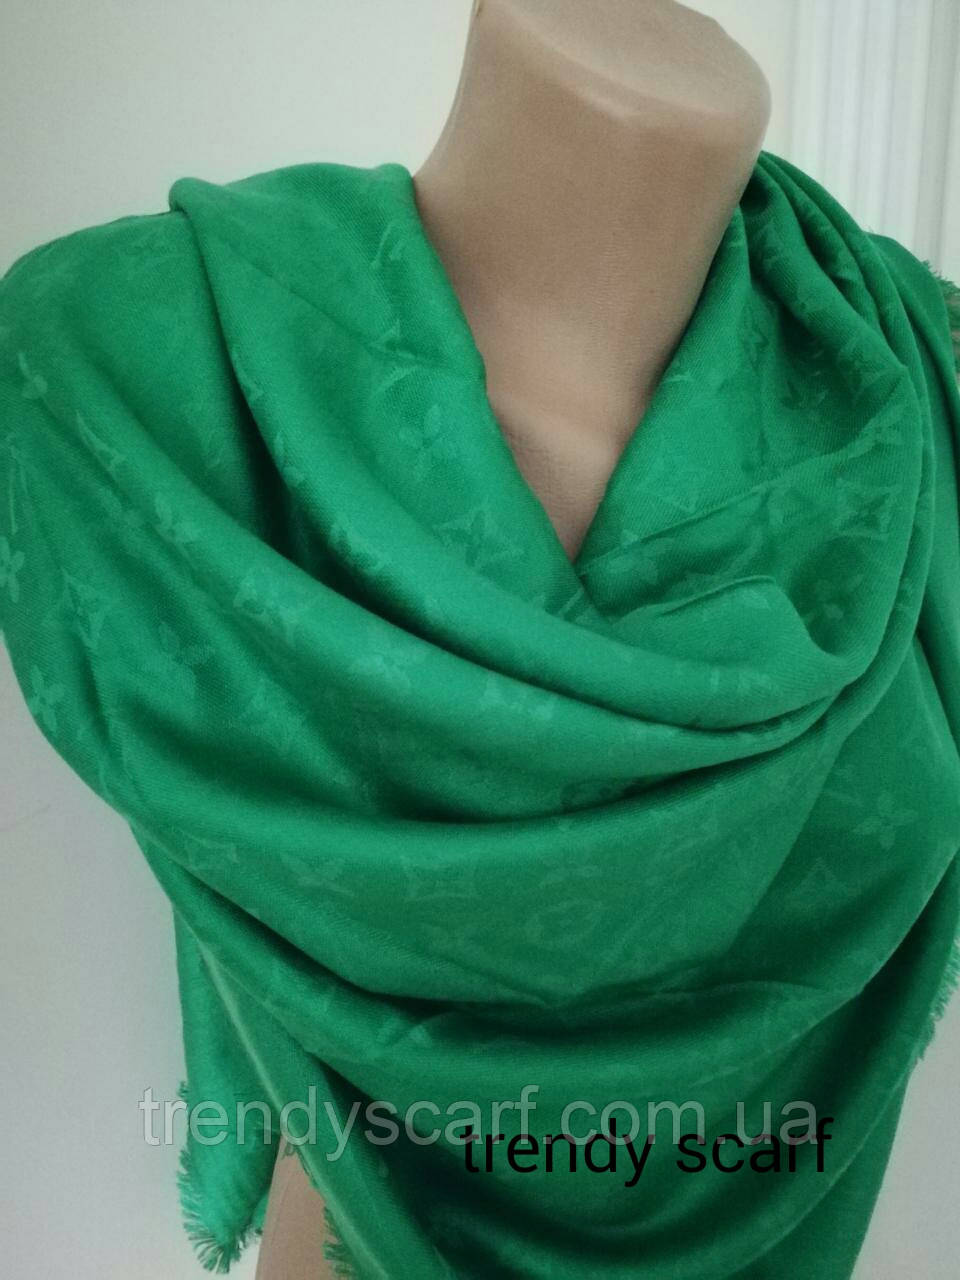 Женский Платок Louis Vuitton бренд Луи Виттон зеленый цвет monogram реплика  шерсть шелк 140 150 daeb7356ff7